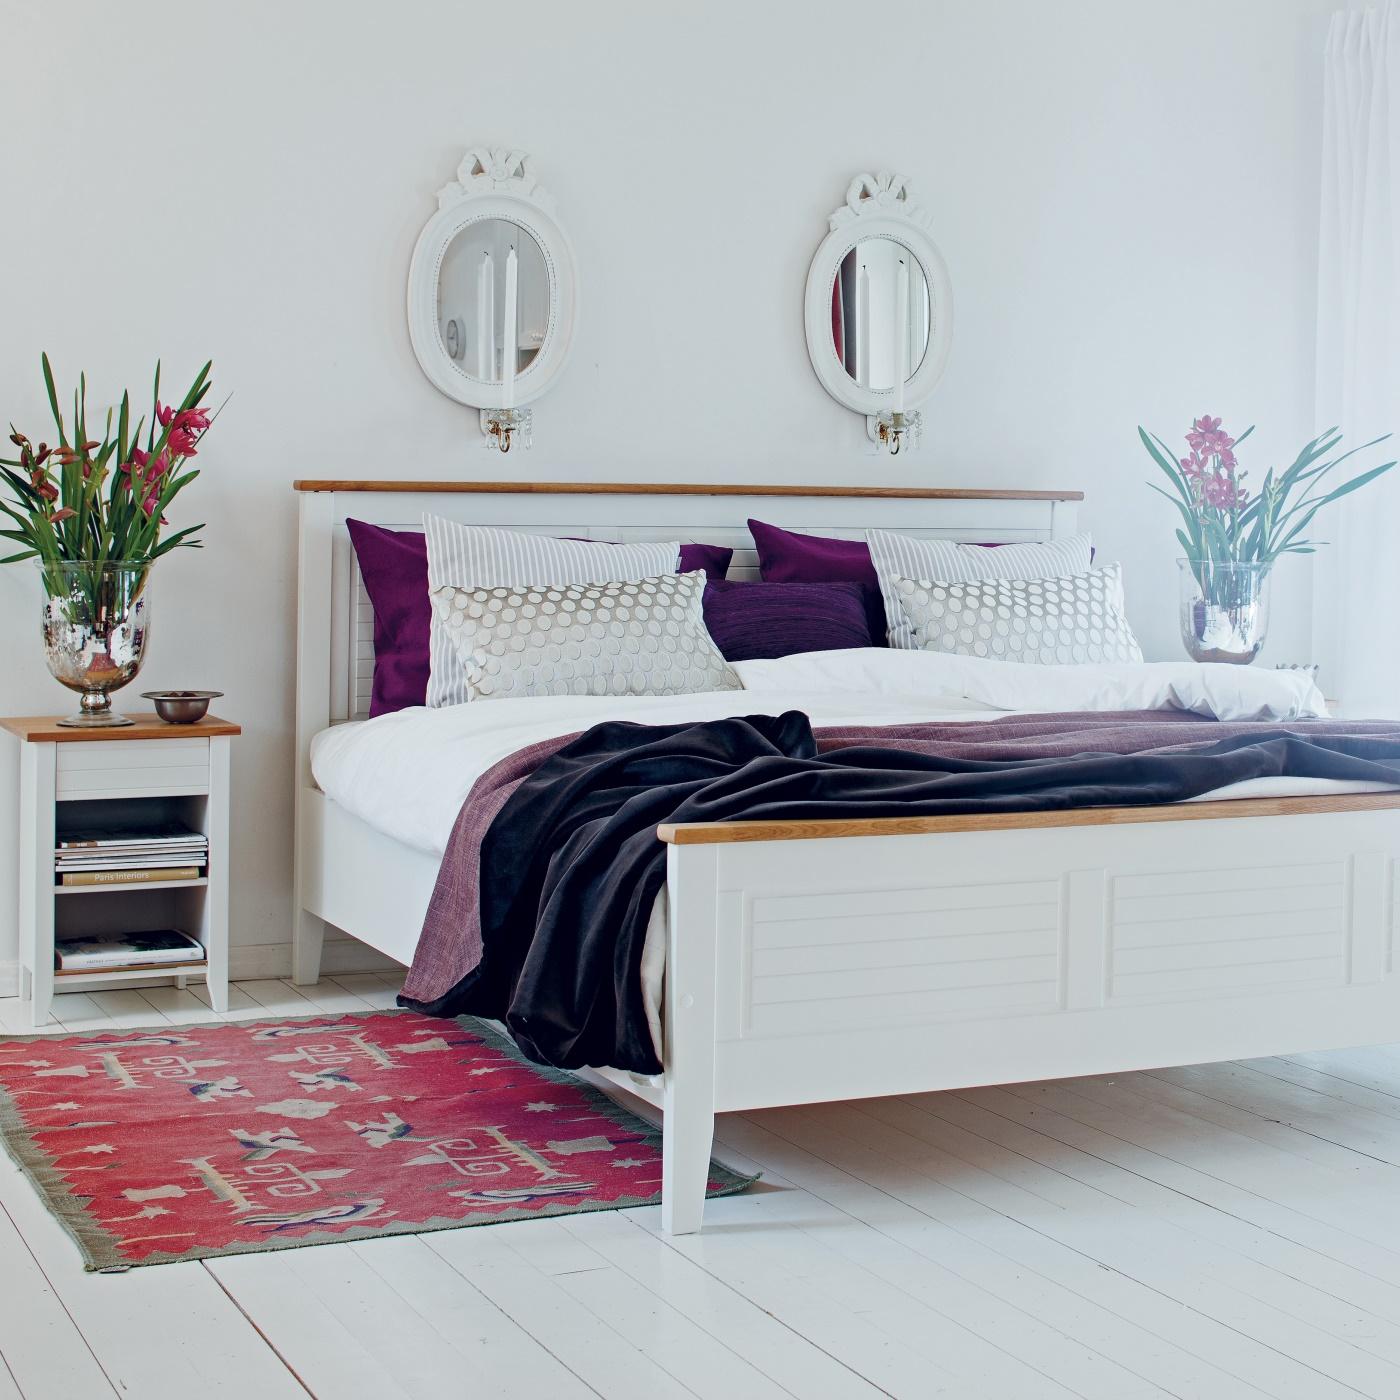 Lundsberg sängram 160 x 200 cm, Mavis